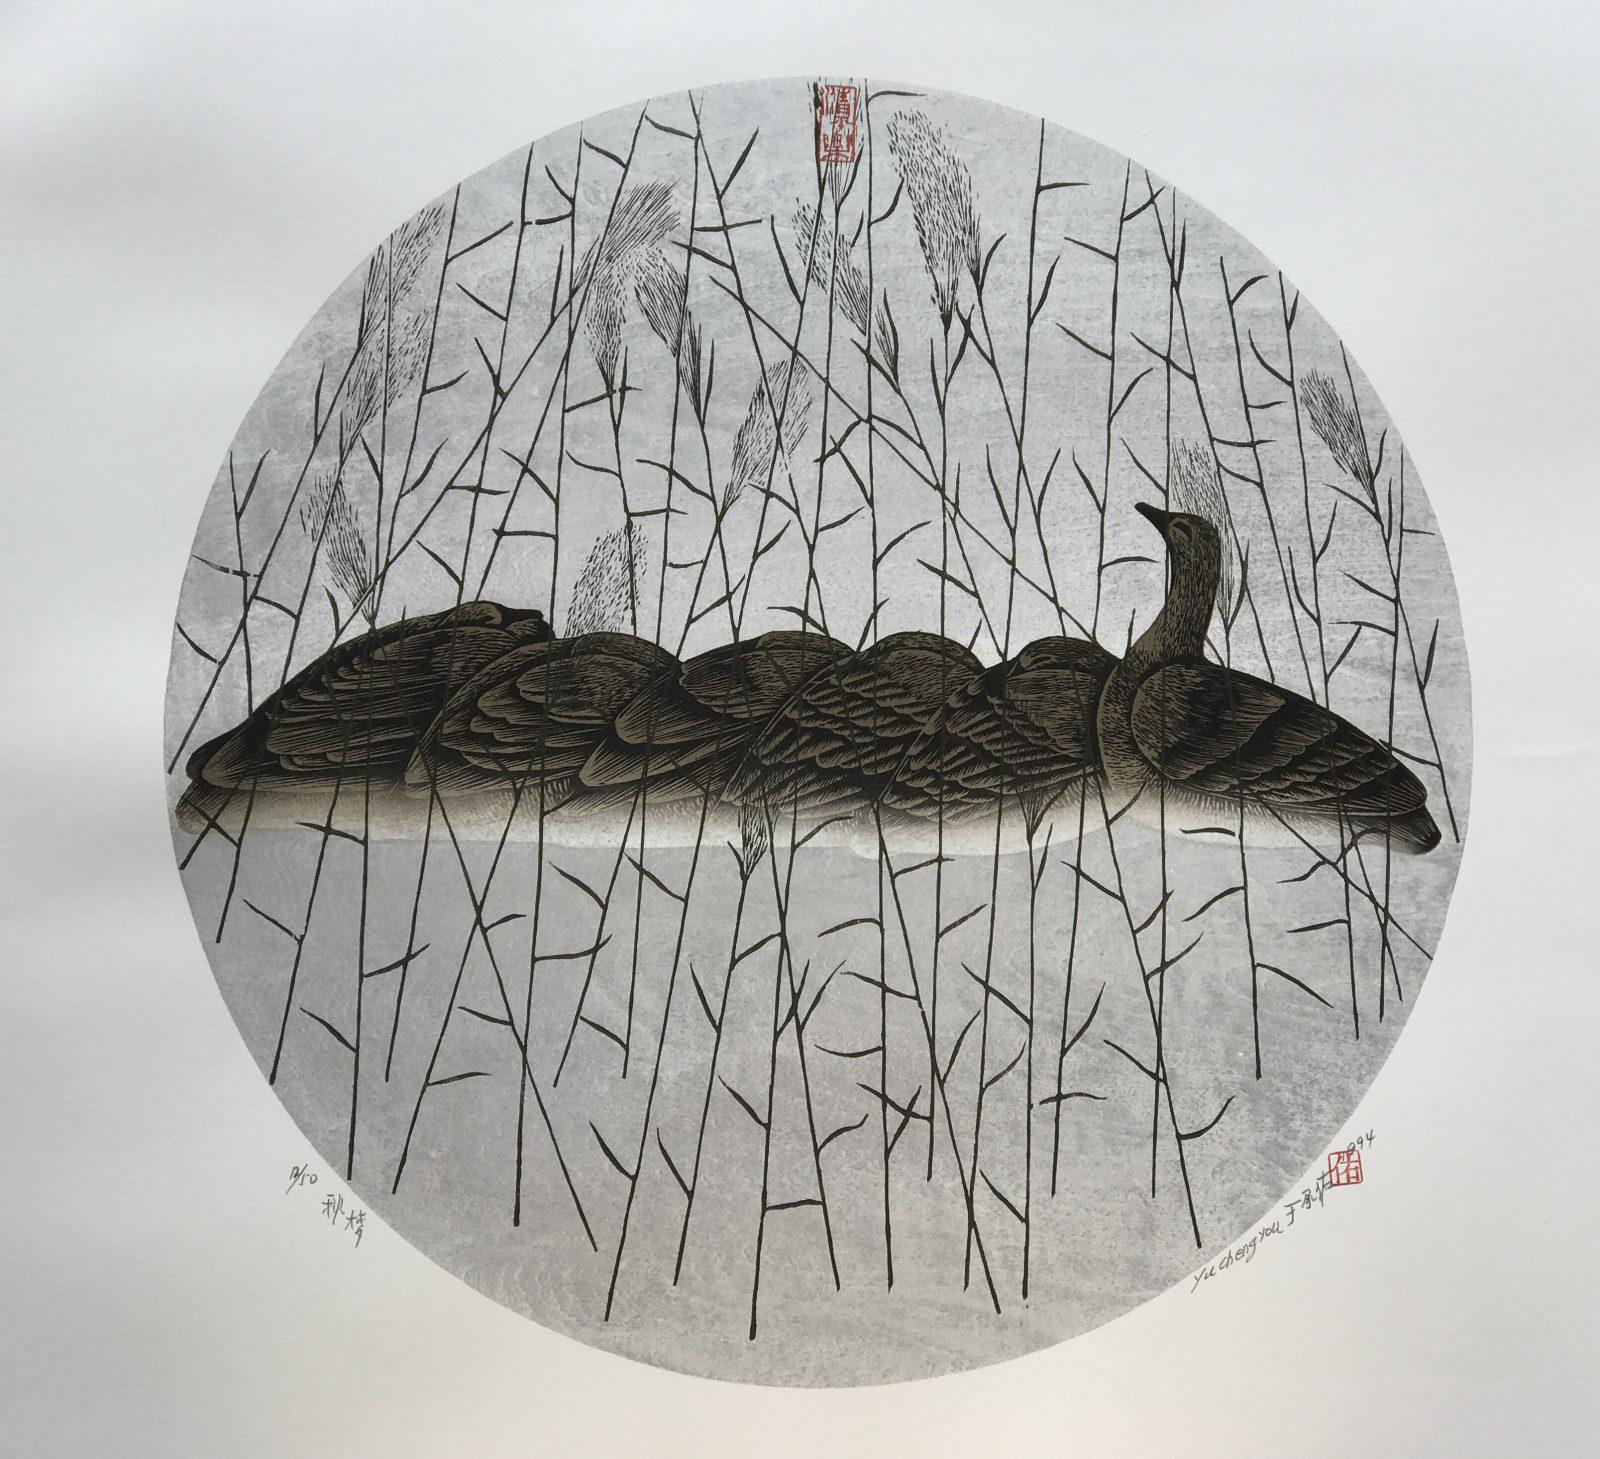 Autumn Dream 12:50 by Yu Chengyou,50.70cm Diameter